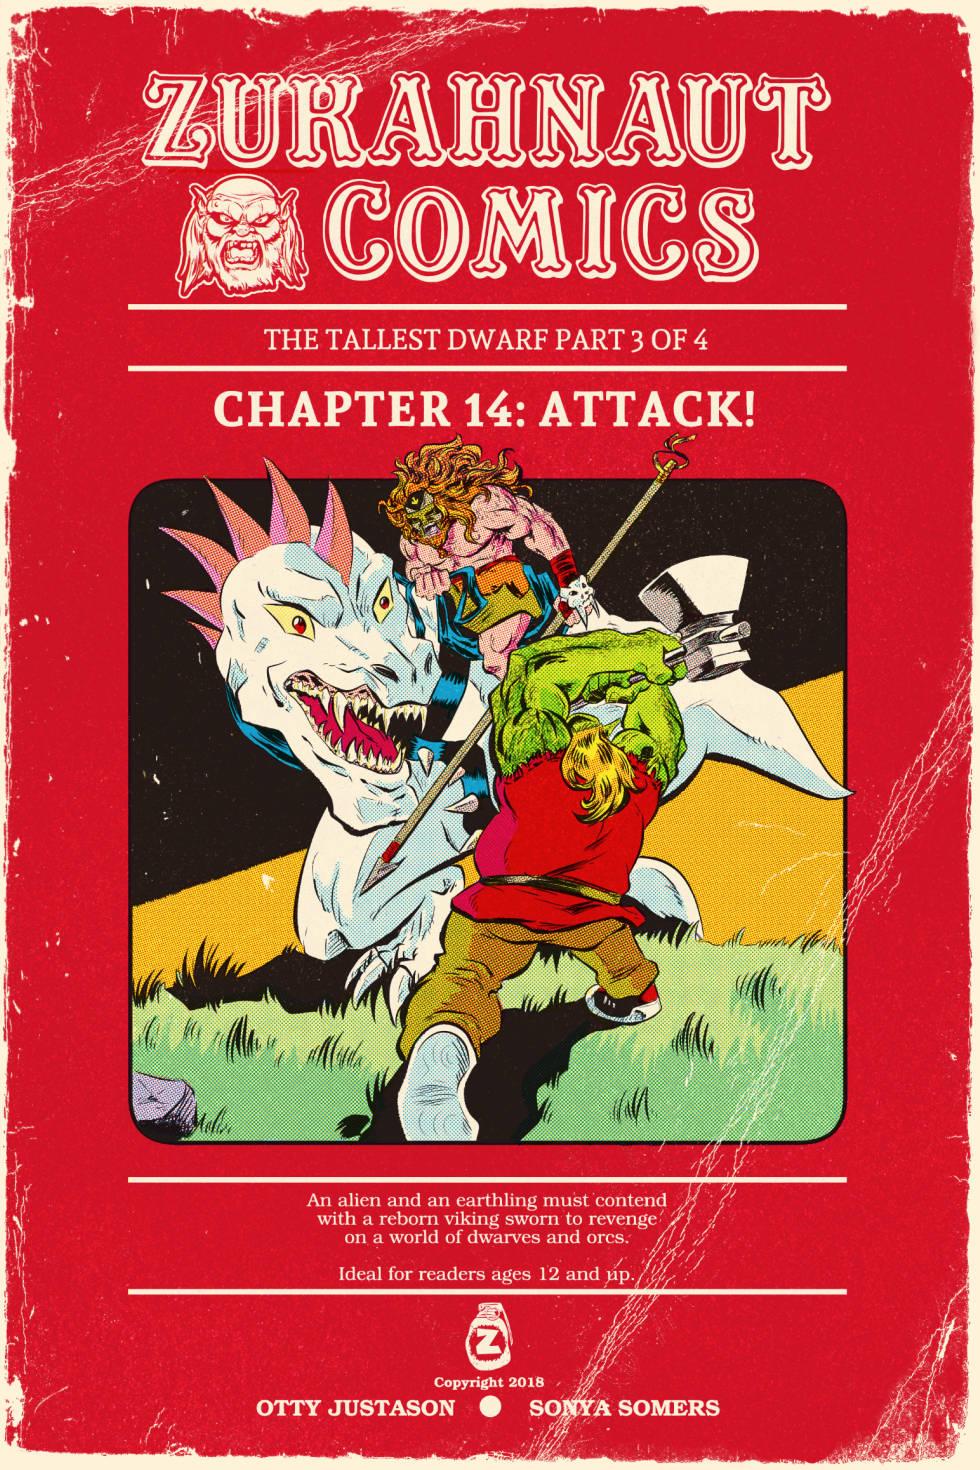 Chapter 14: The Tallest Dwarf Part 3